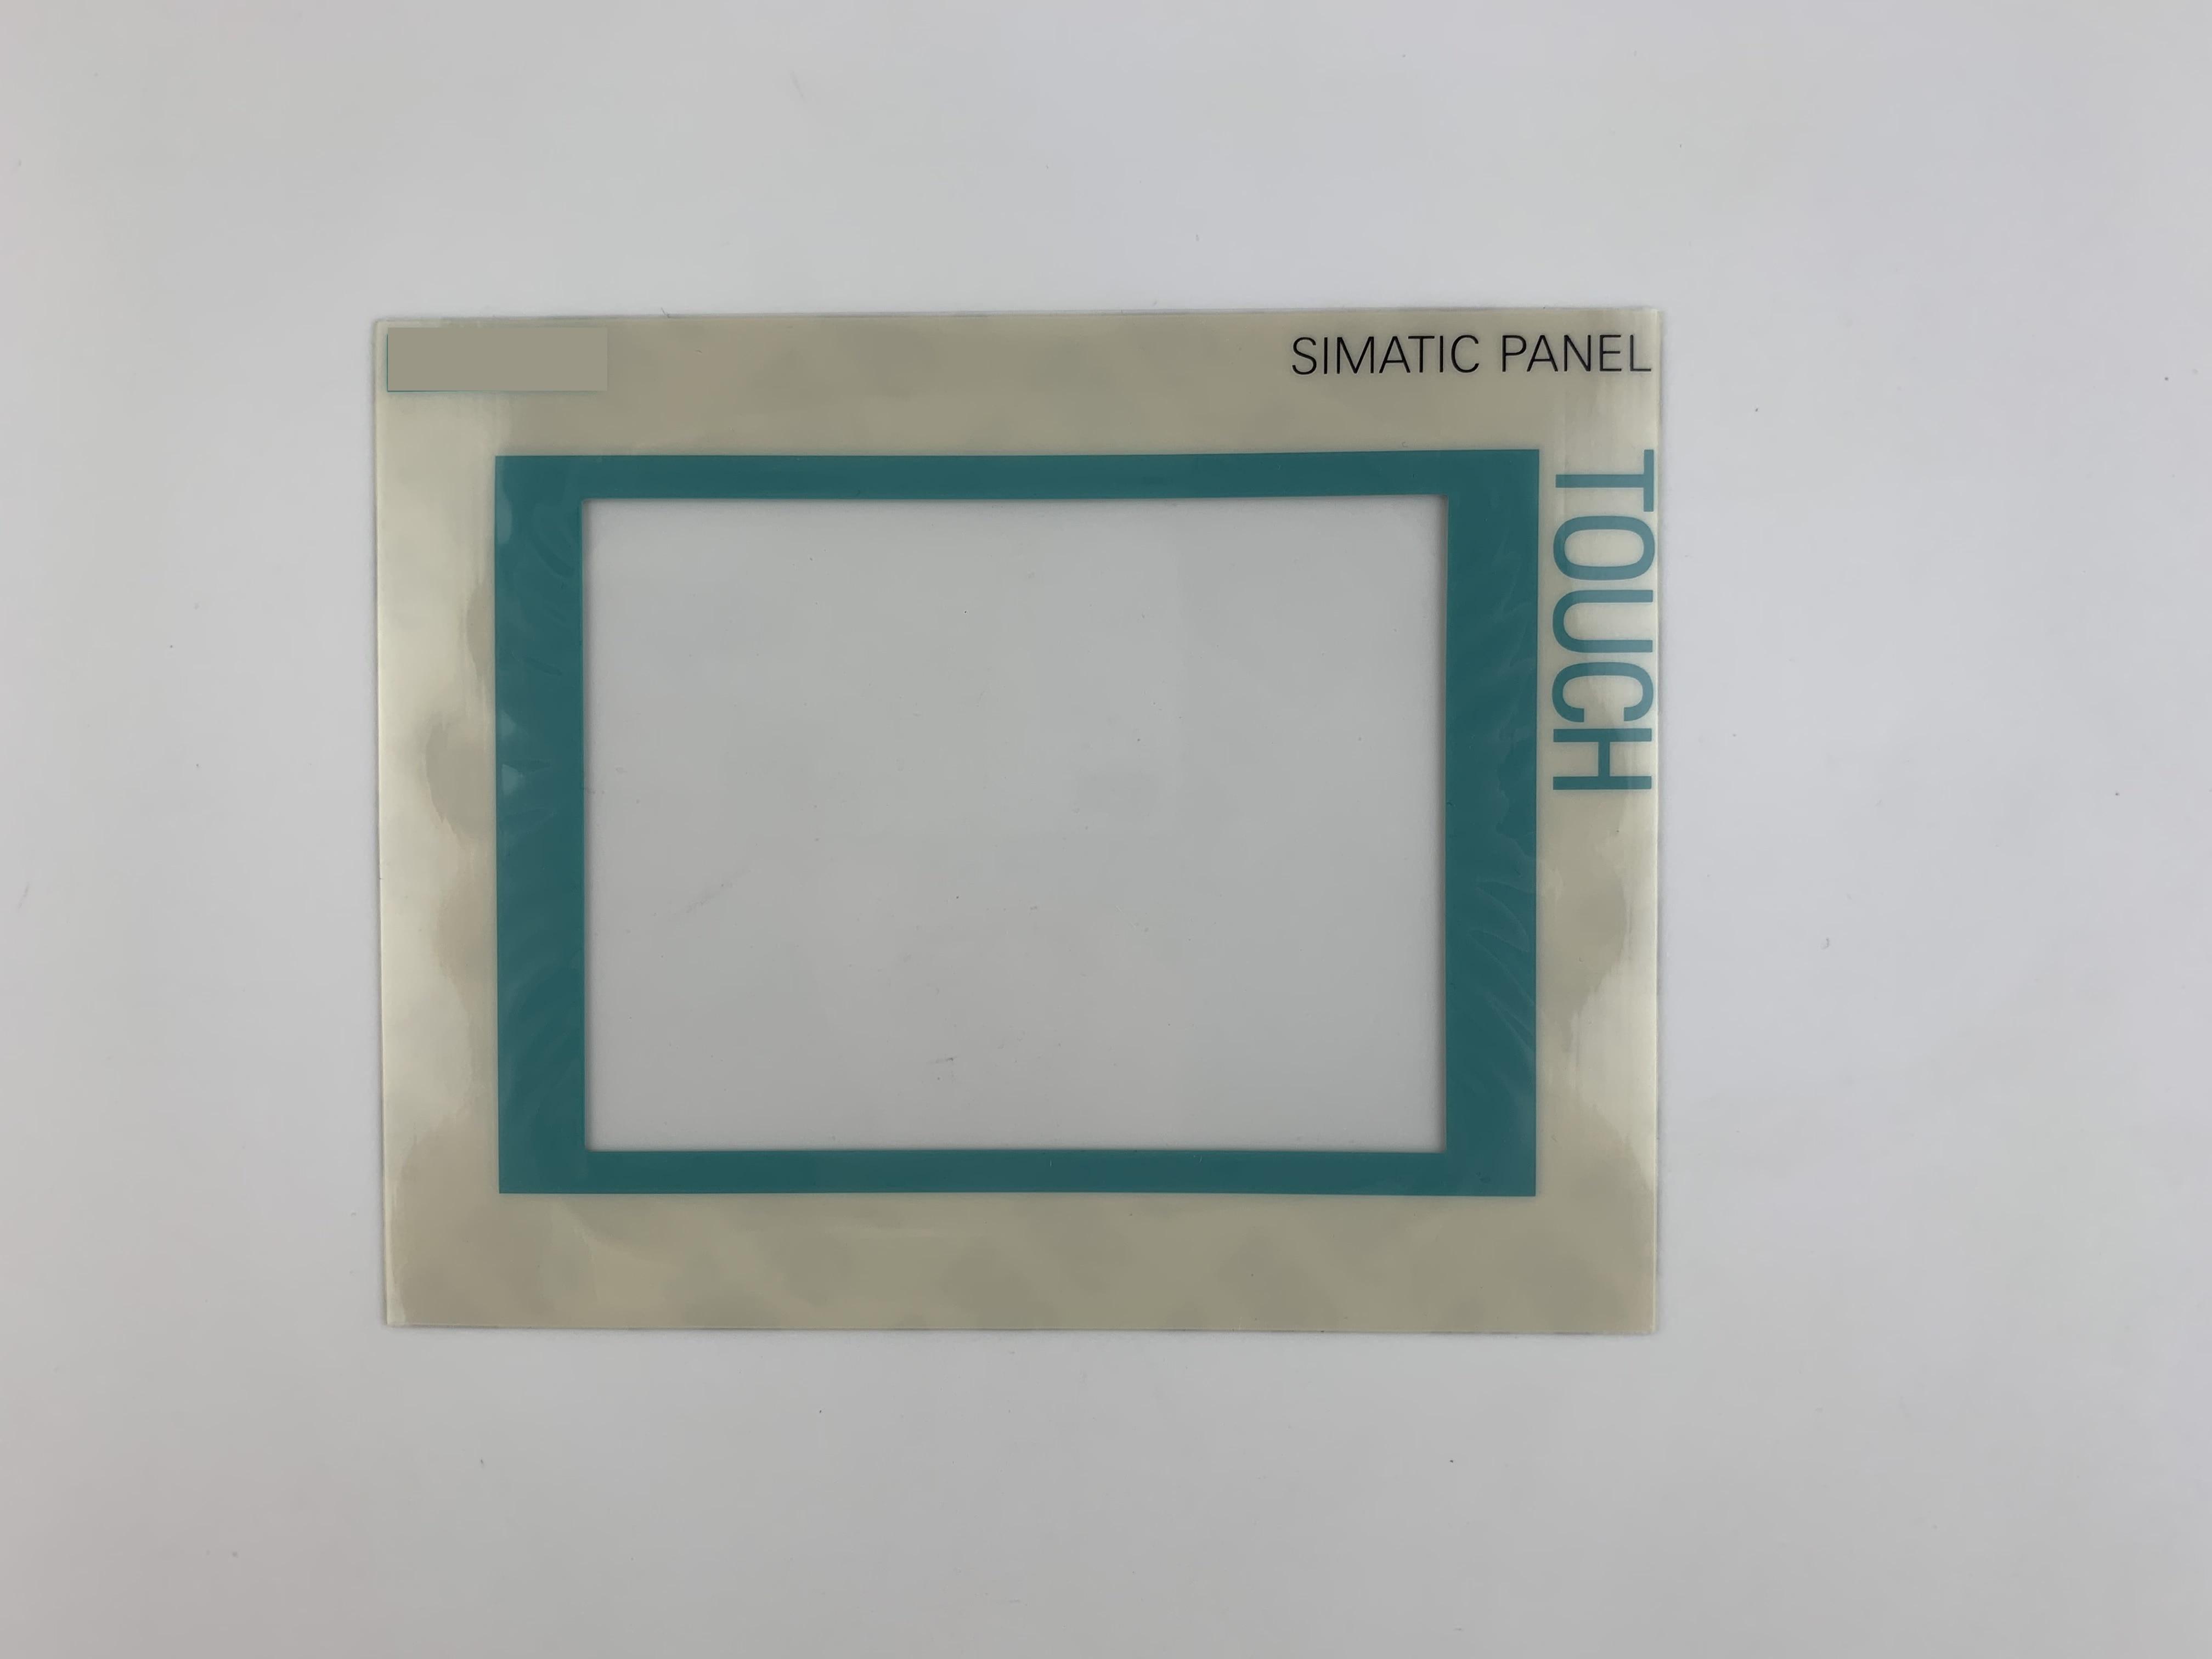 TP270-6 6AV6545-0CA10-0AX0 6AV6 545-0CA10-0AX0 Membrane Film For HMI Panel Repair~do It Yourself, Have In Stock